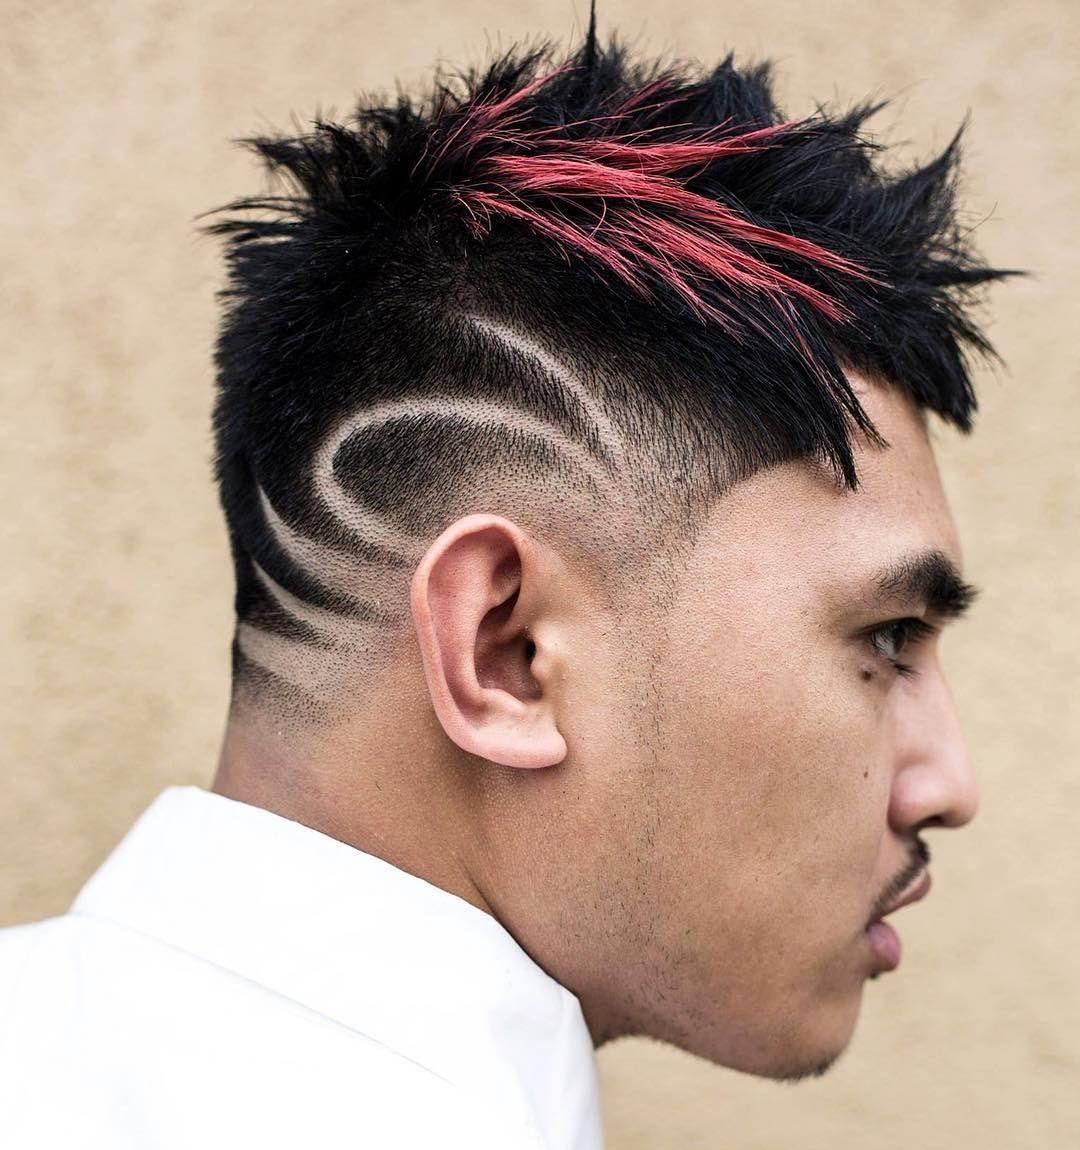 150 Best Short Haircuts For Men Most Popular Short Hair Styles Mens Hairstyles Short Short Hair Styles Haircut Designs